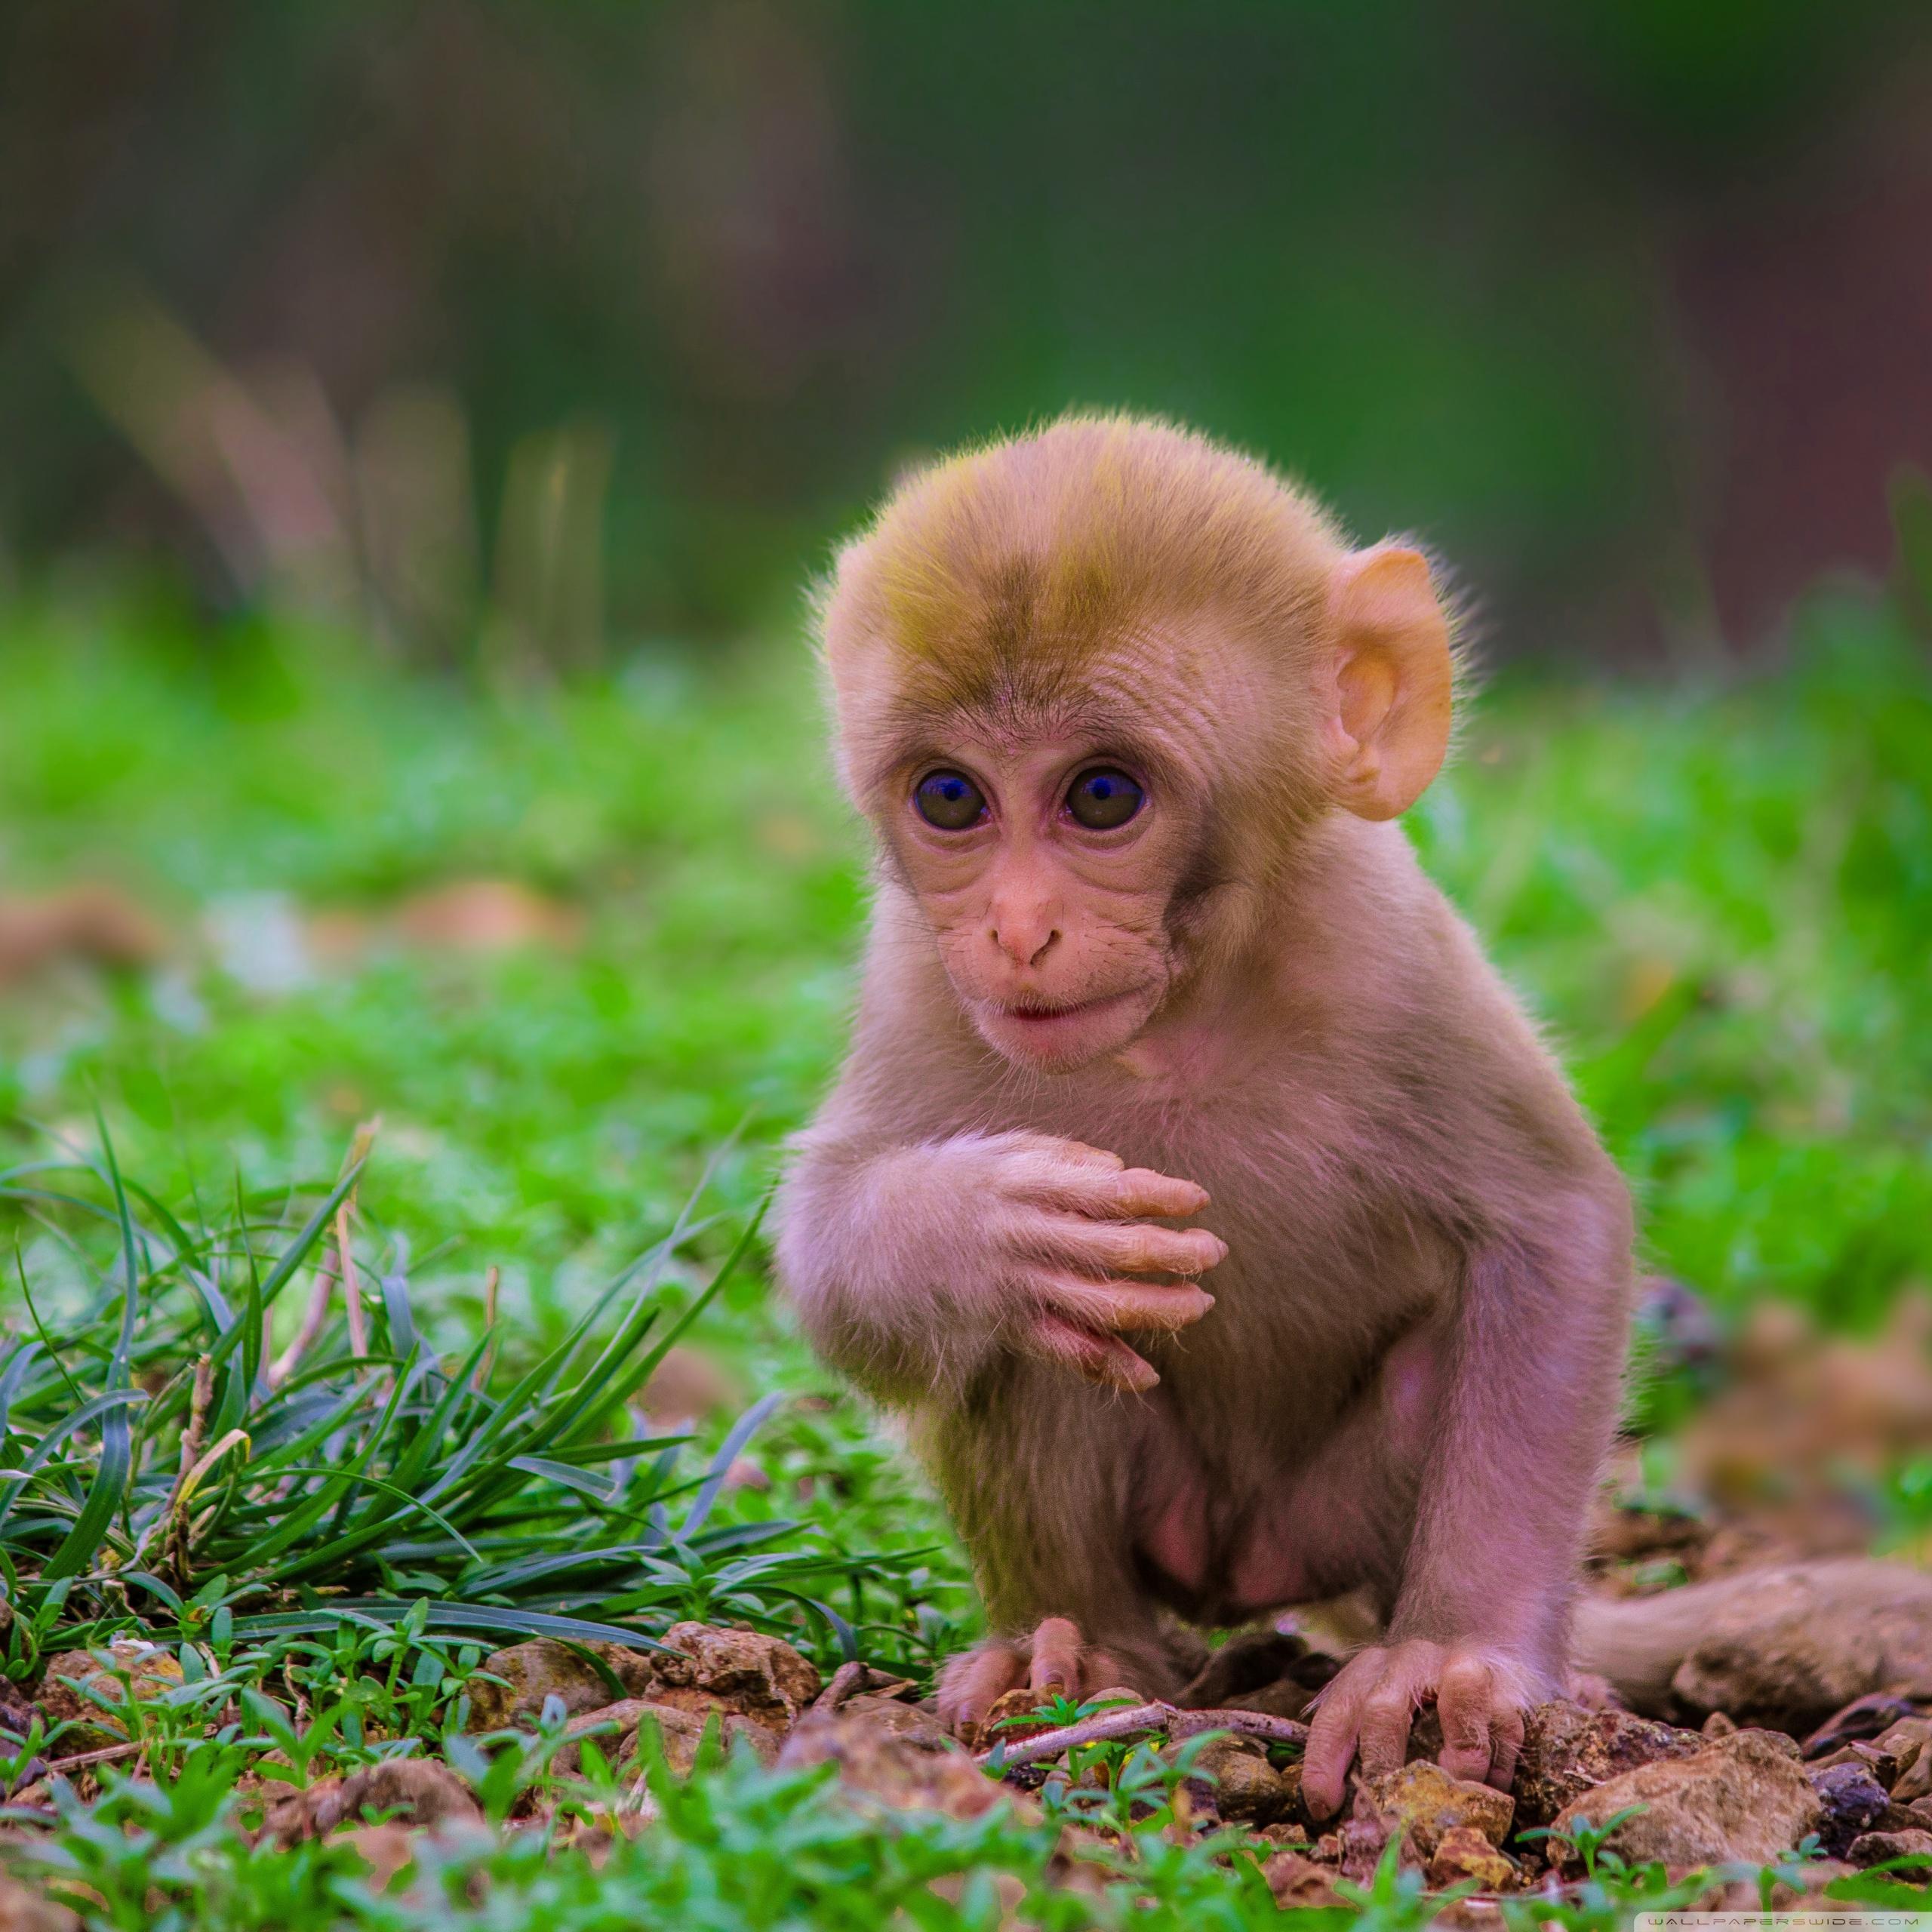 Cute baby monkey 4k hd desktop wallpaper for 4k ultra hd tv tablet 11 voltagebd Image collections